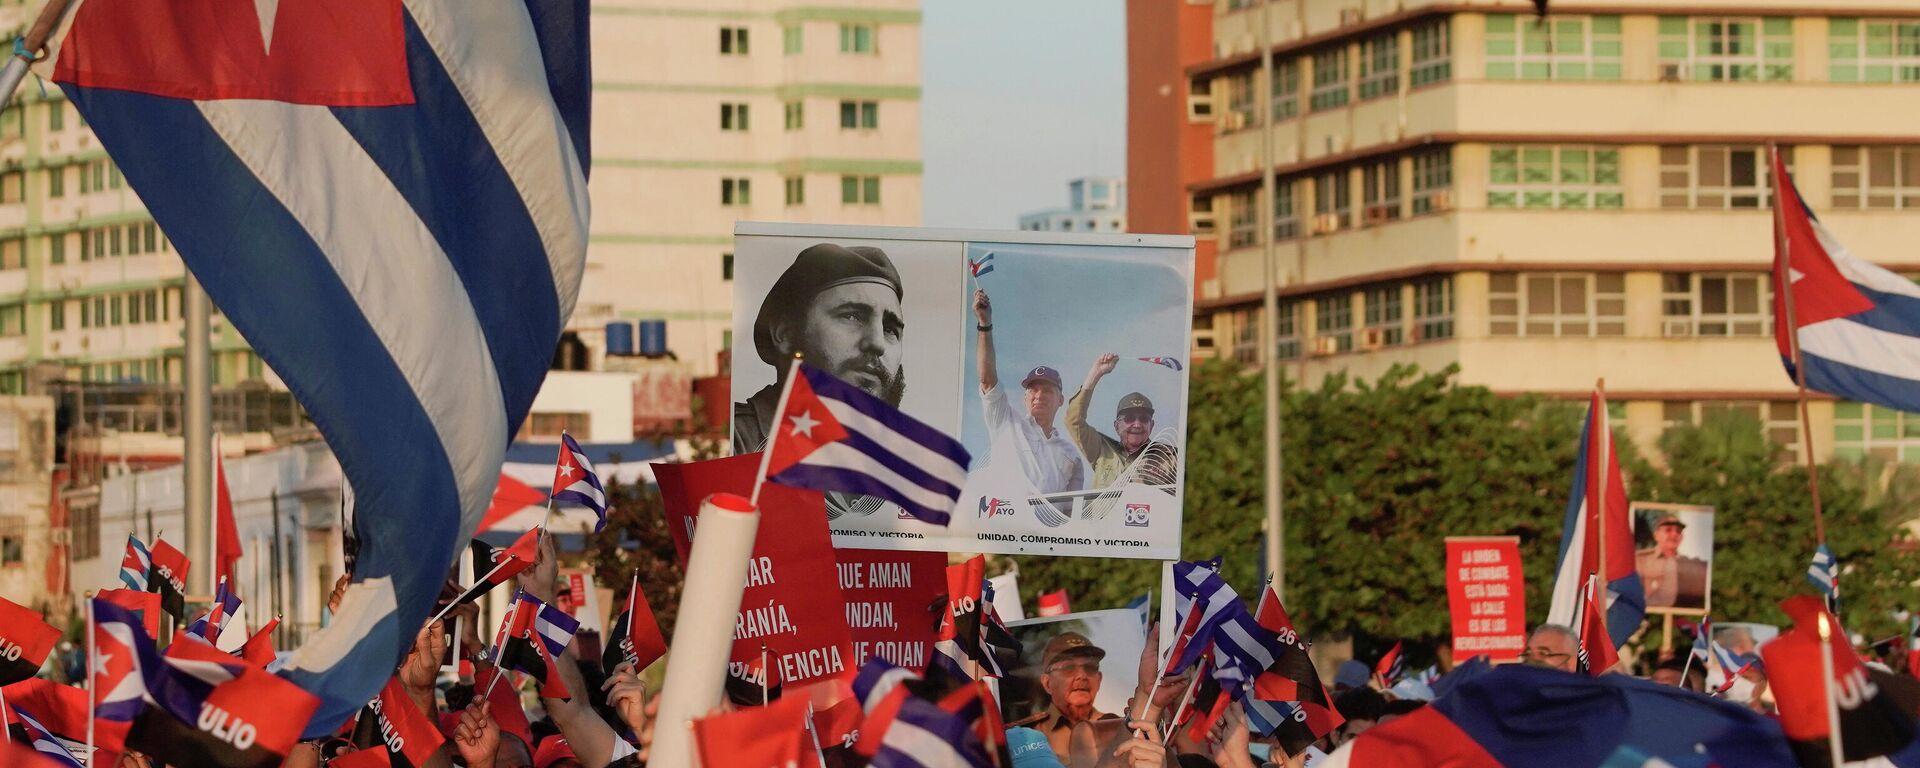 Manifestación en Cuba - Sputnik Mundo, 1920, 04.08.2021